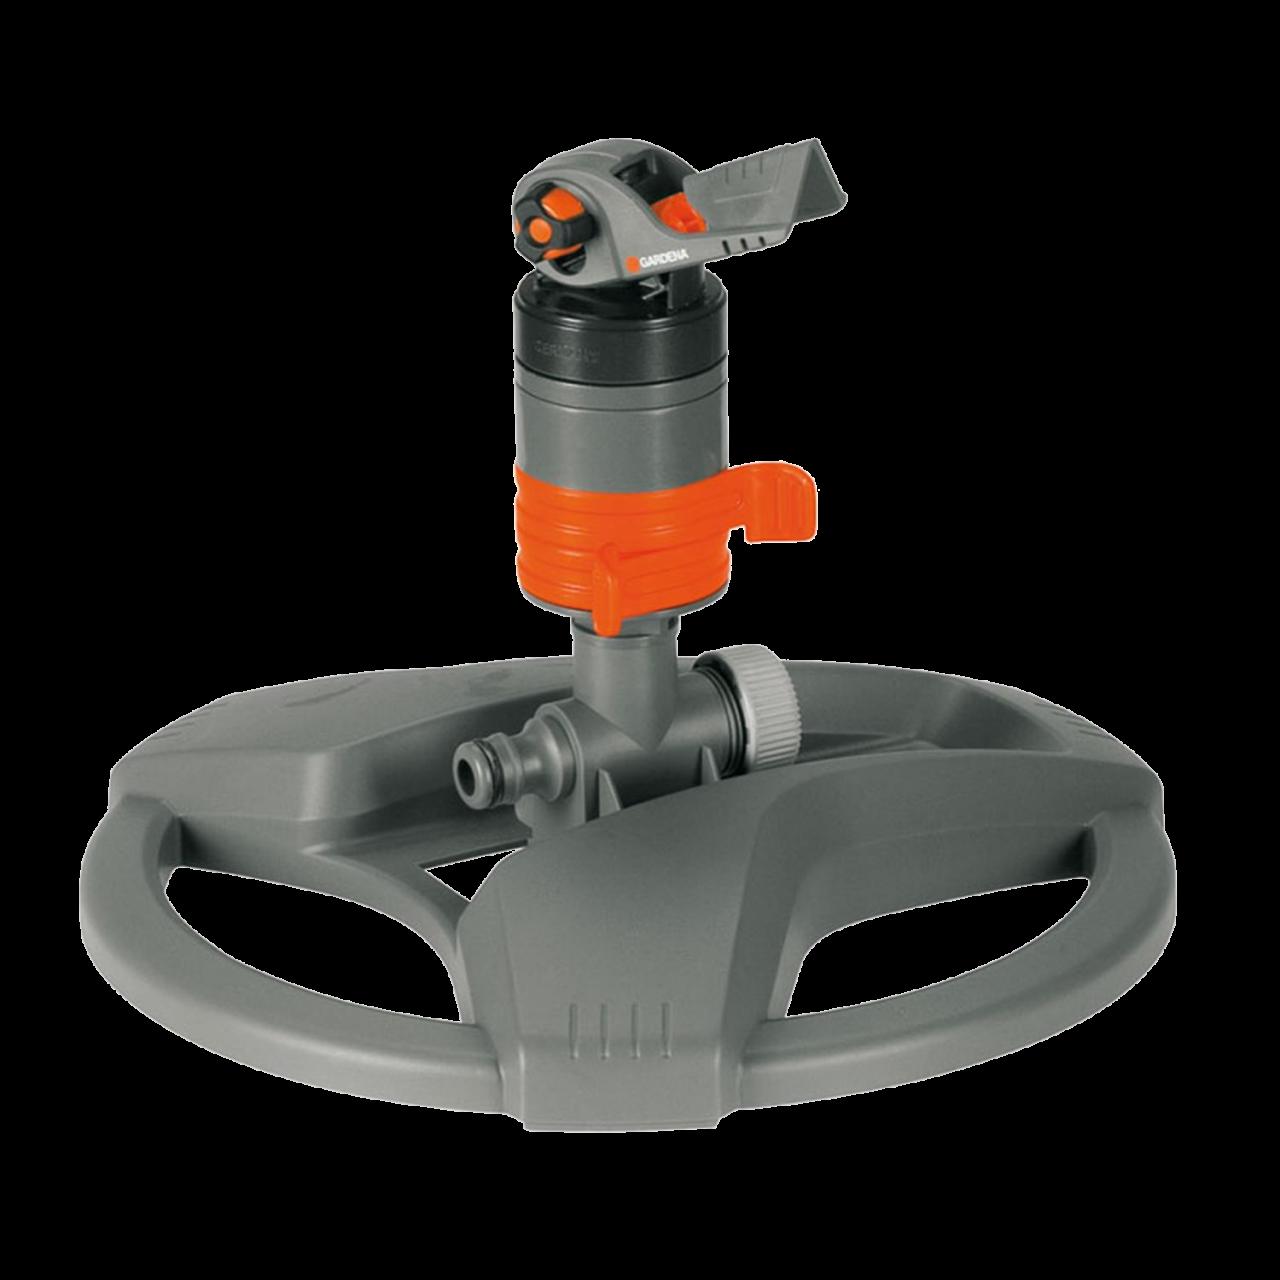 Gardena 8143-20 Comfort Turbinenregner mit Schlitten Regner Rasensprenger 450m²